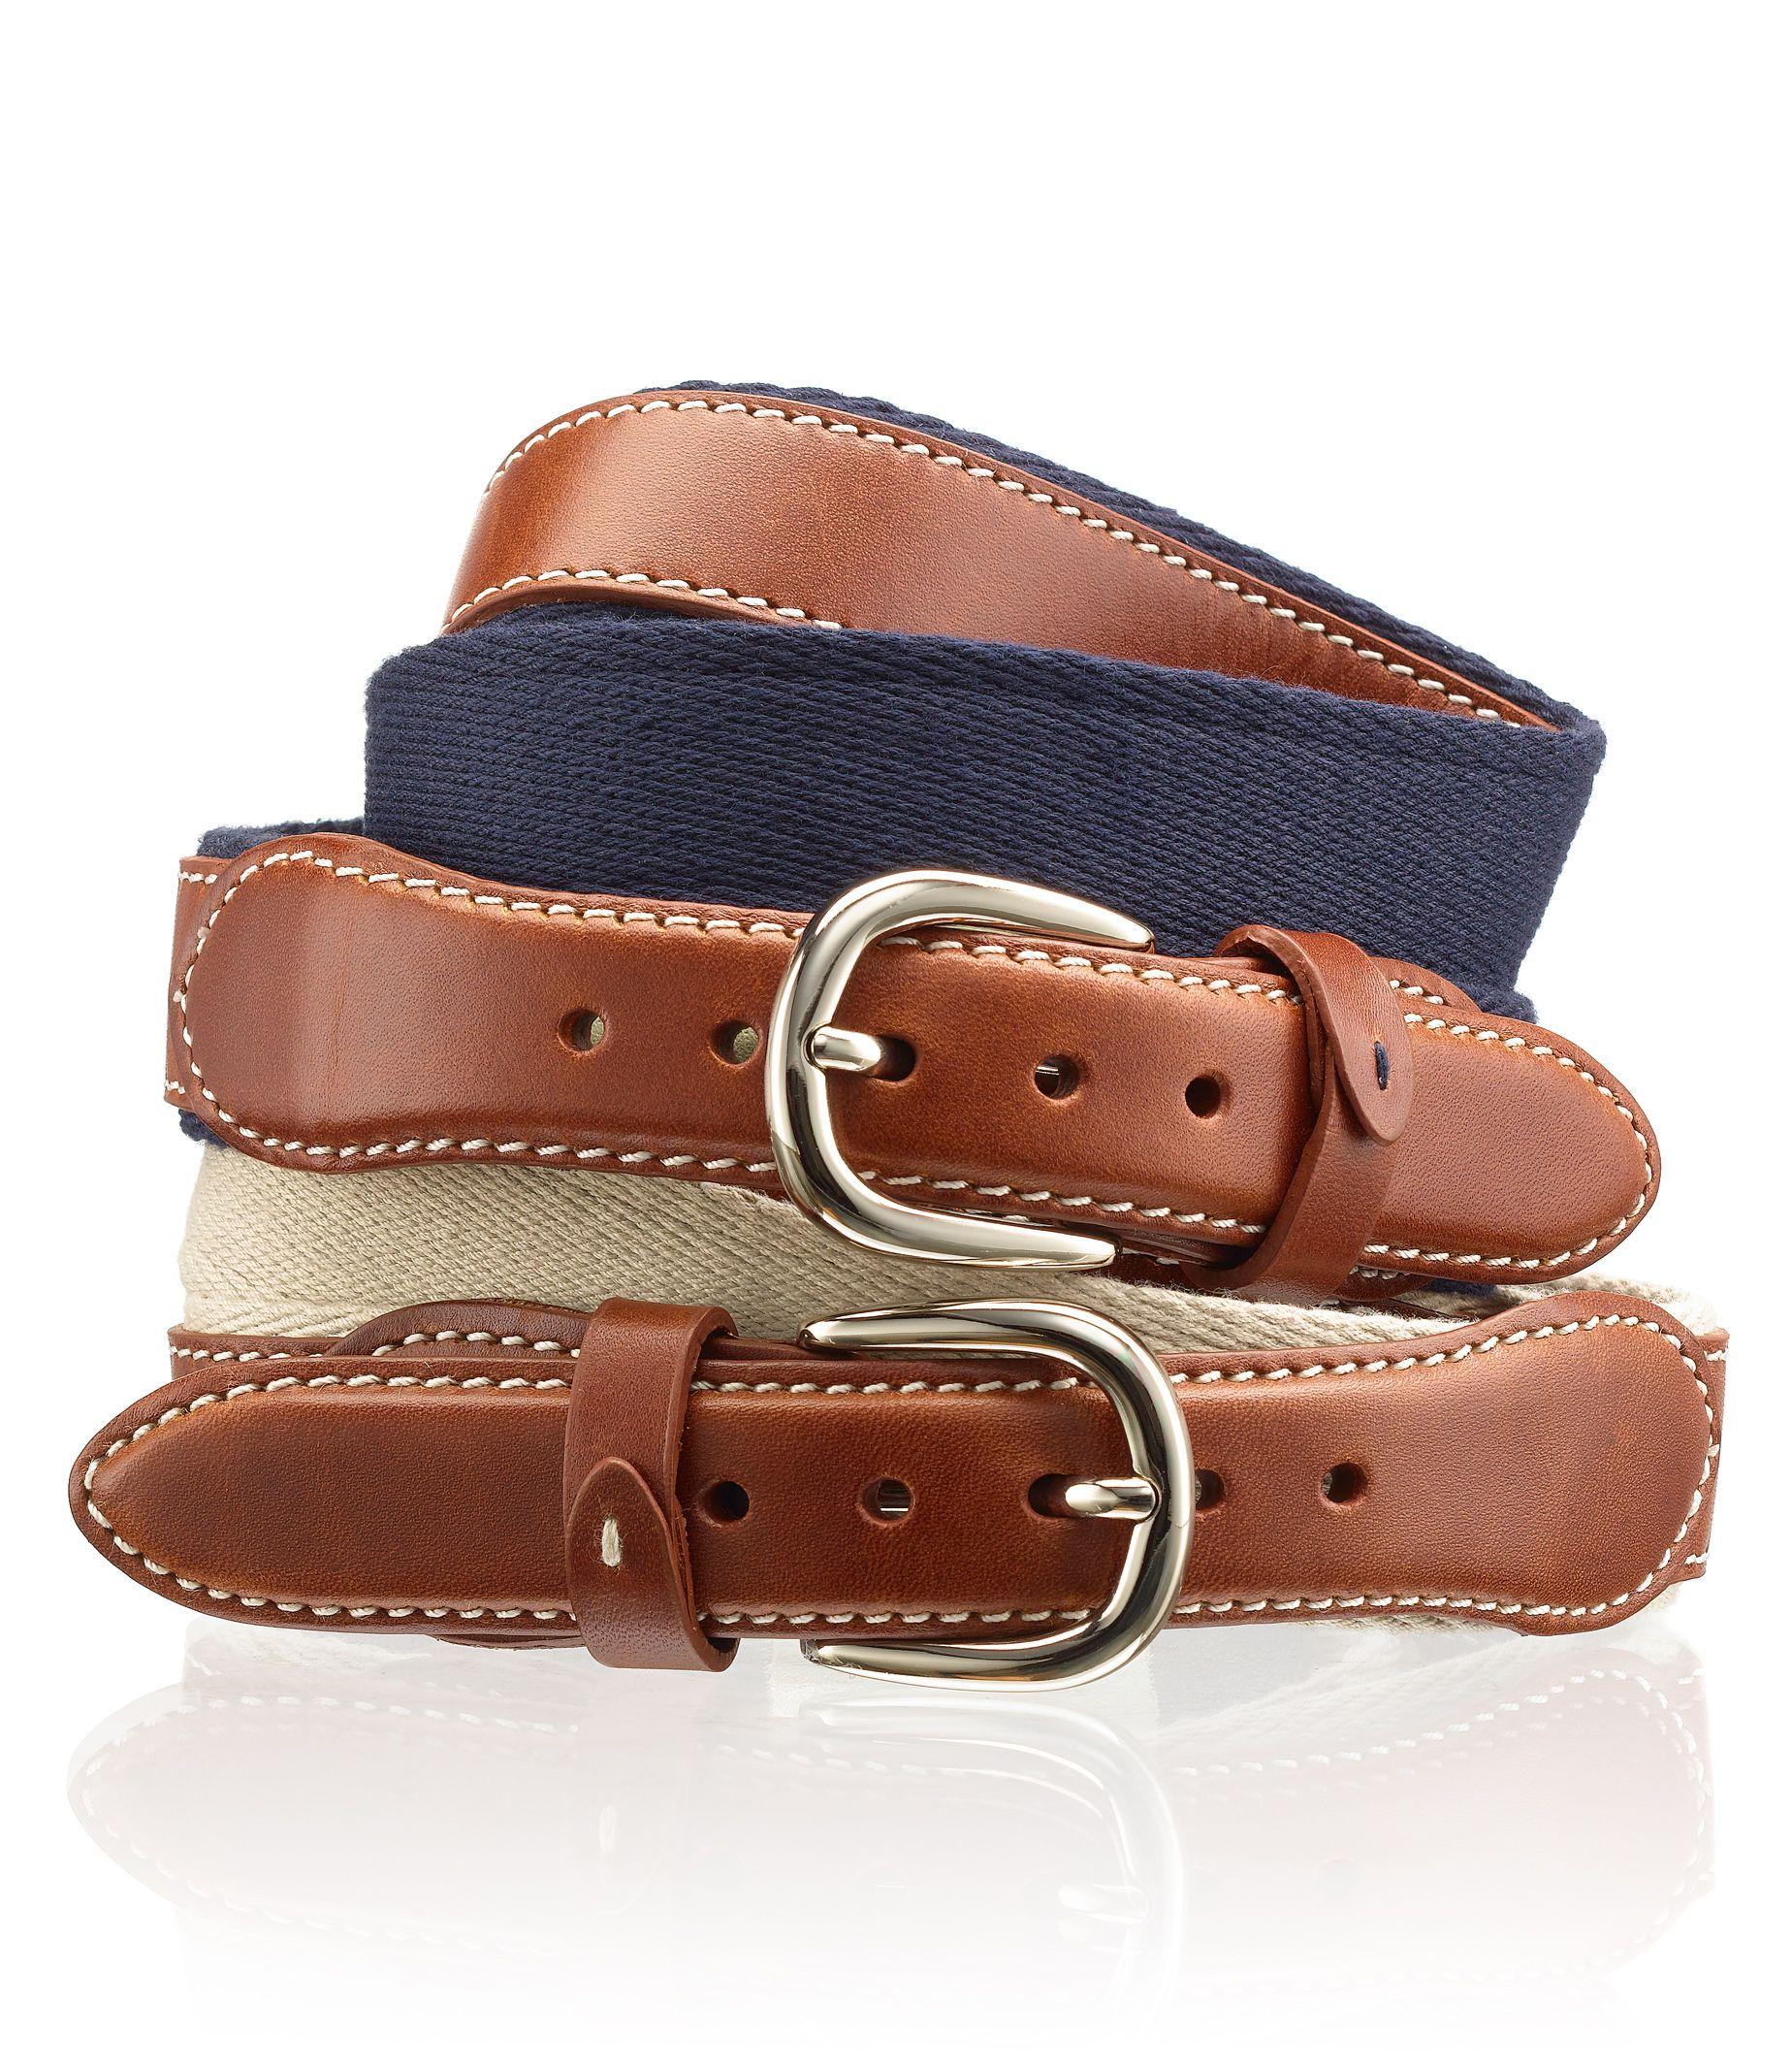 Canvas-Backed Weekender Belt